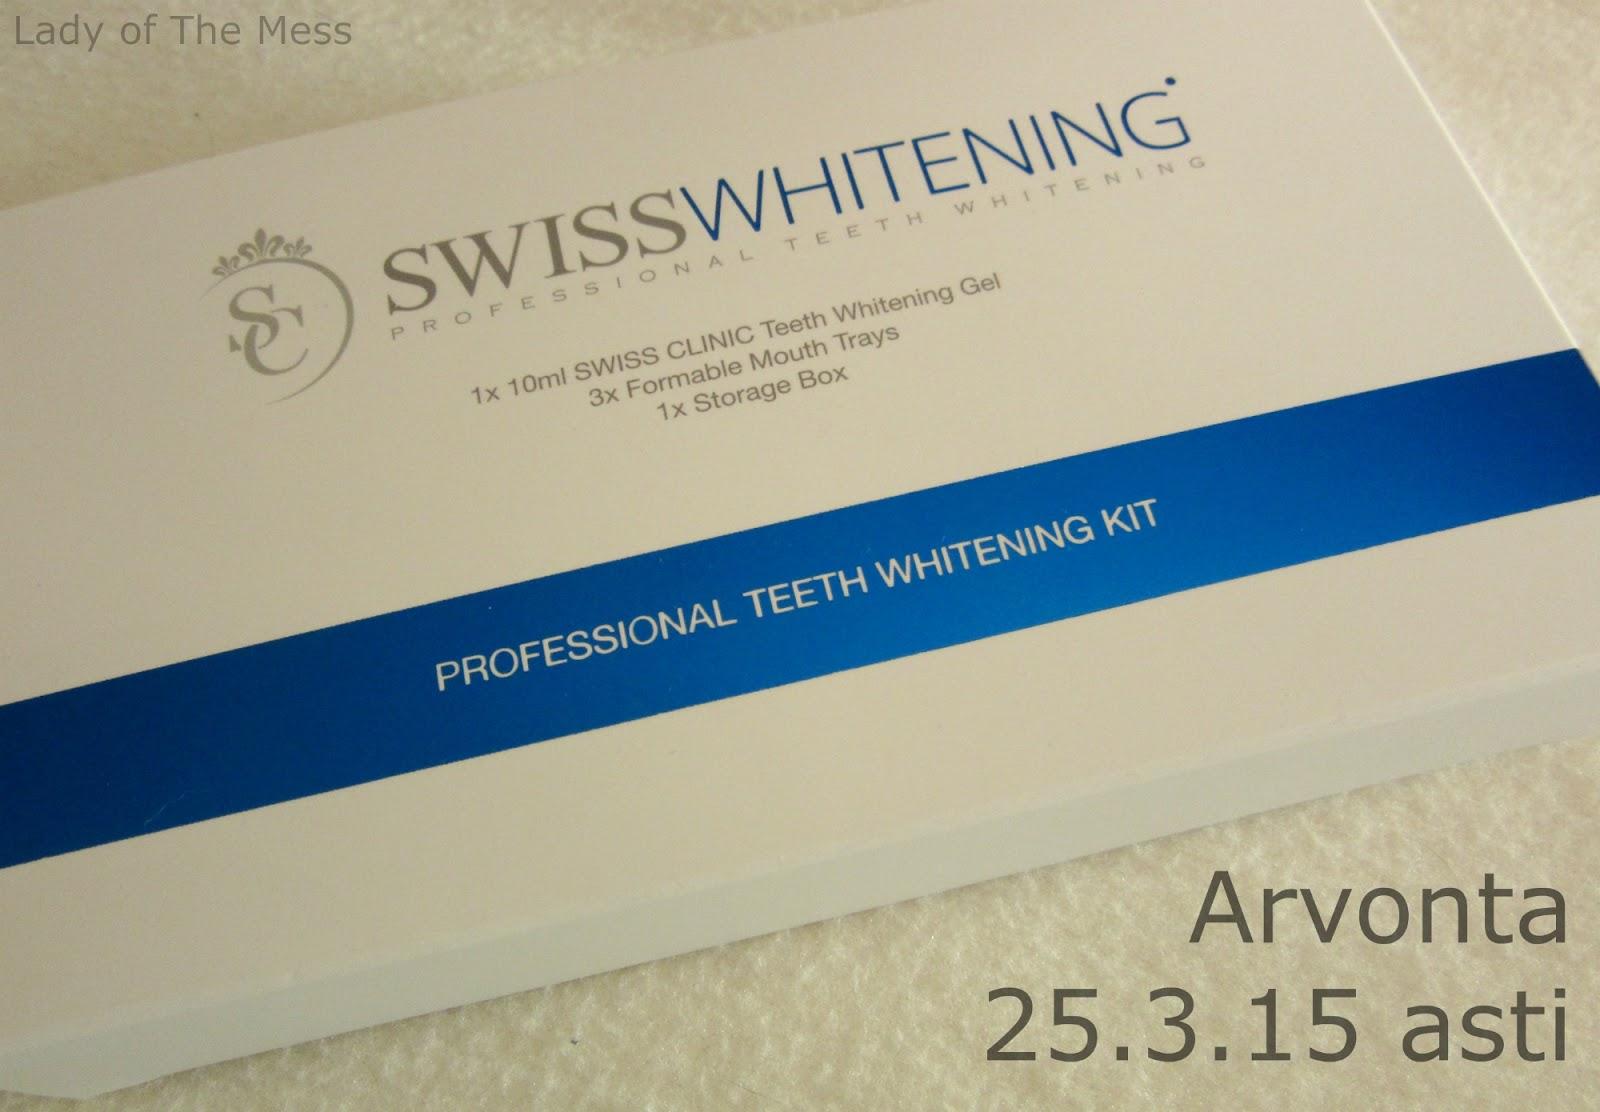 hampaidenvalkaisu, teeth whitening, swiss whitening, arvonta, giveaway